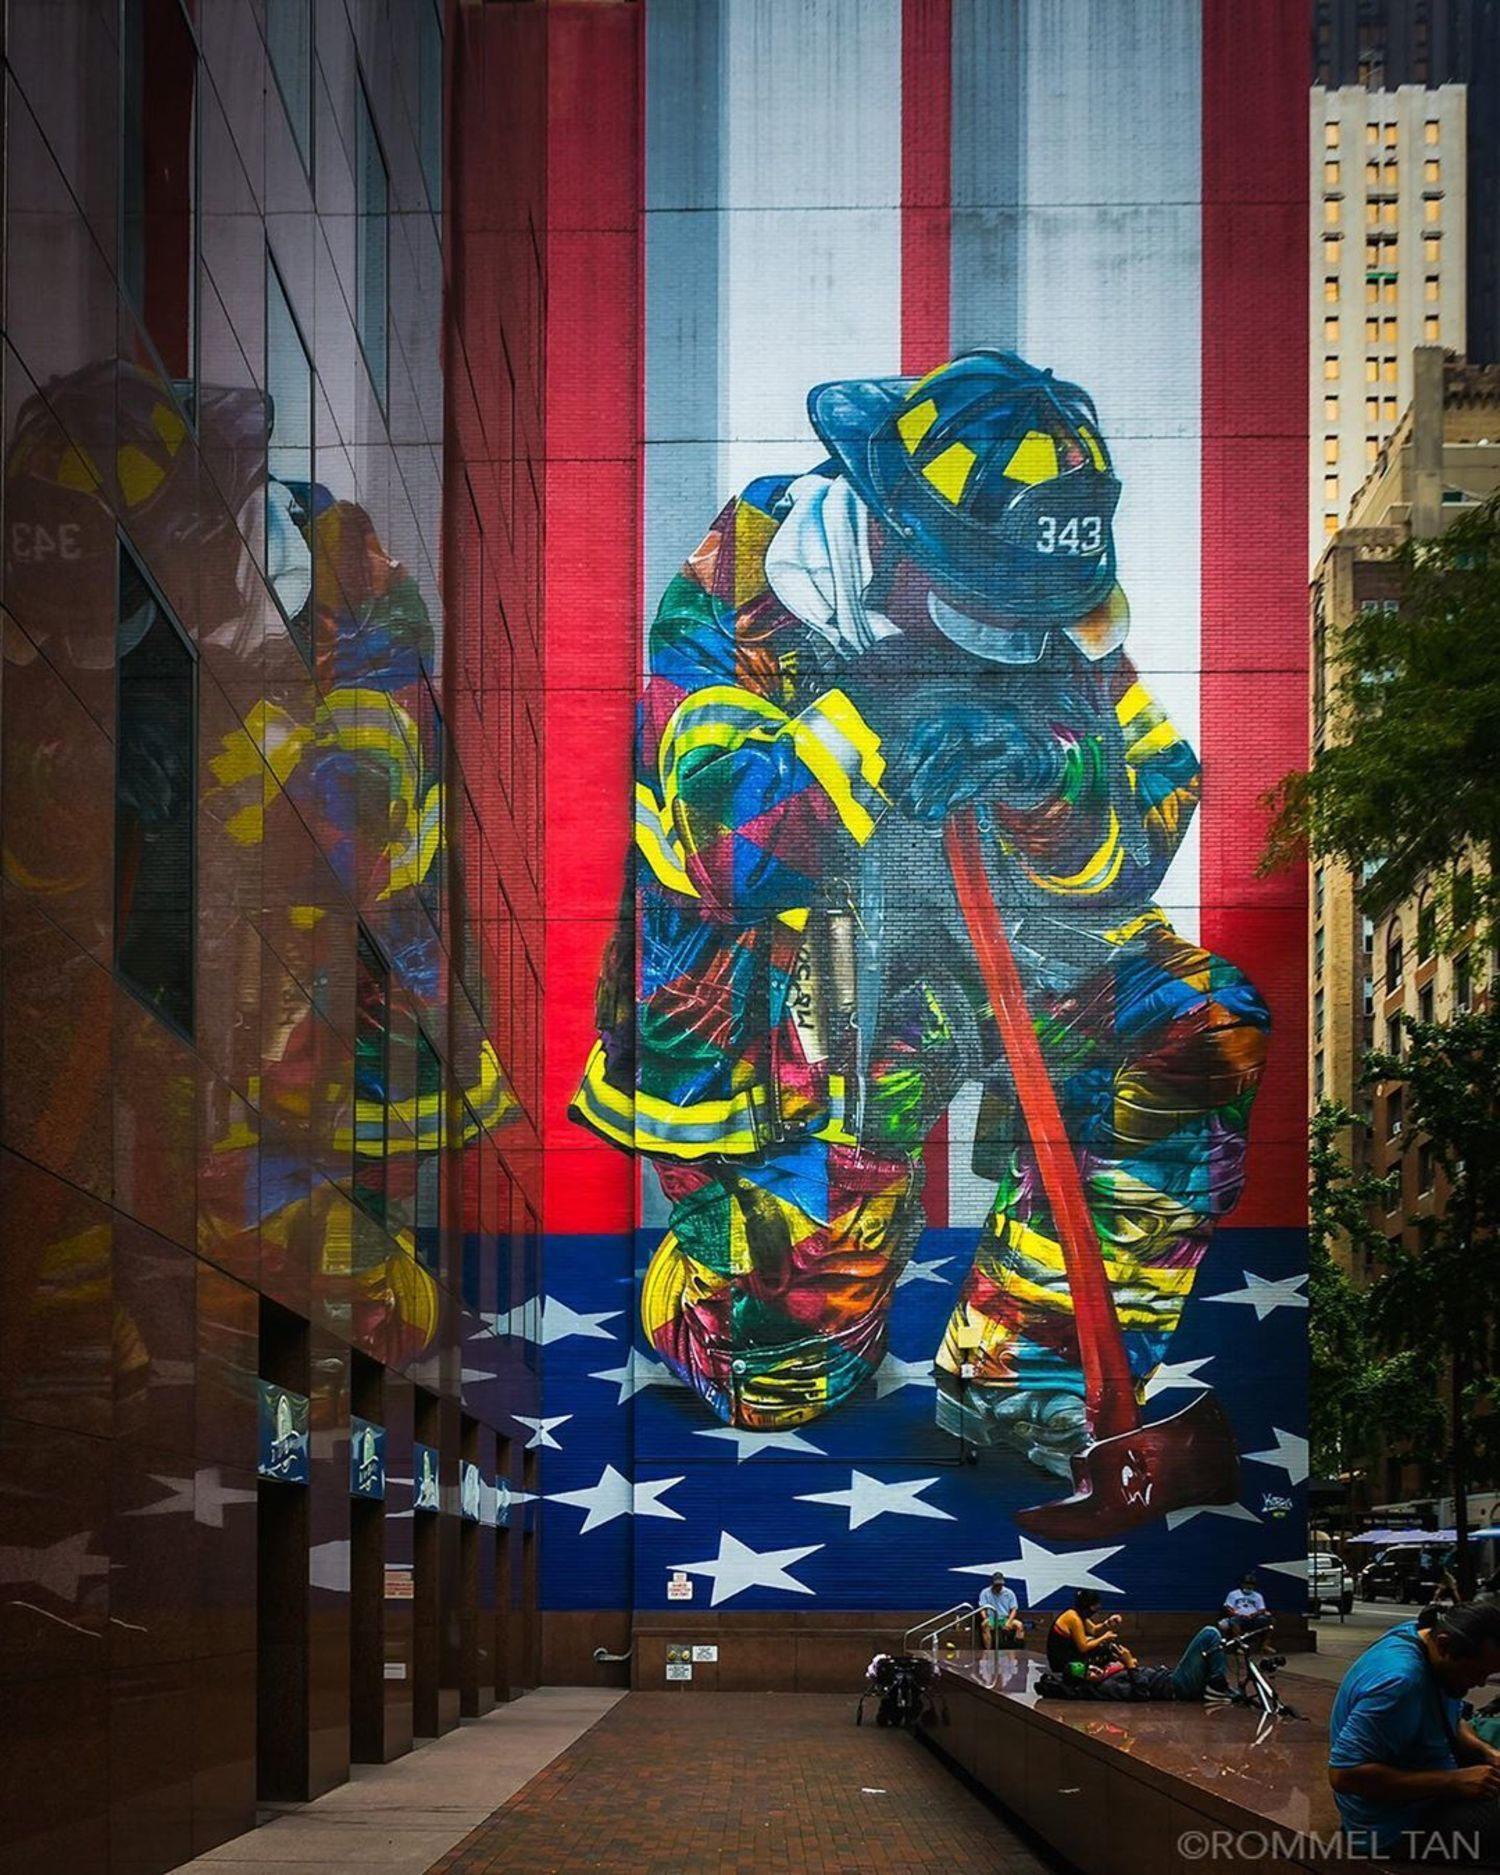 """The Braves of 9/11"", Eduardo Kobra, 2018, East 49th Street and 3rd Avenue, Manhattan"